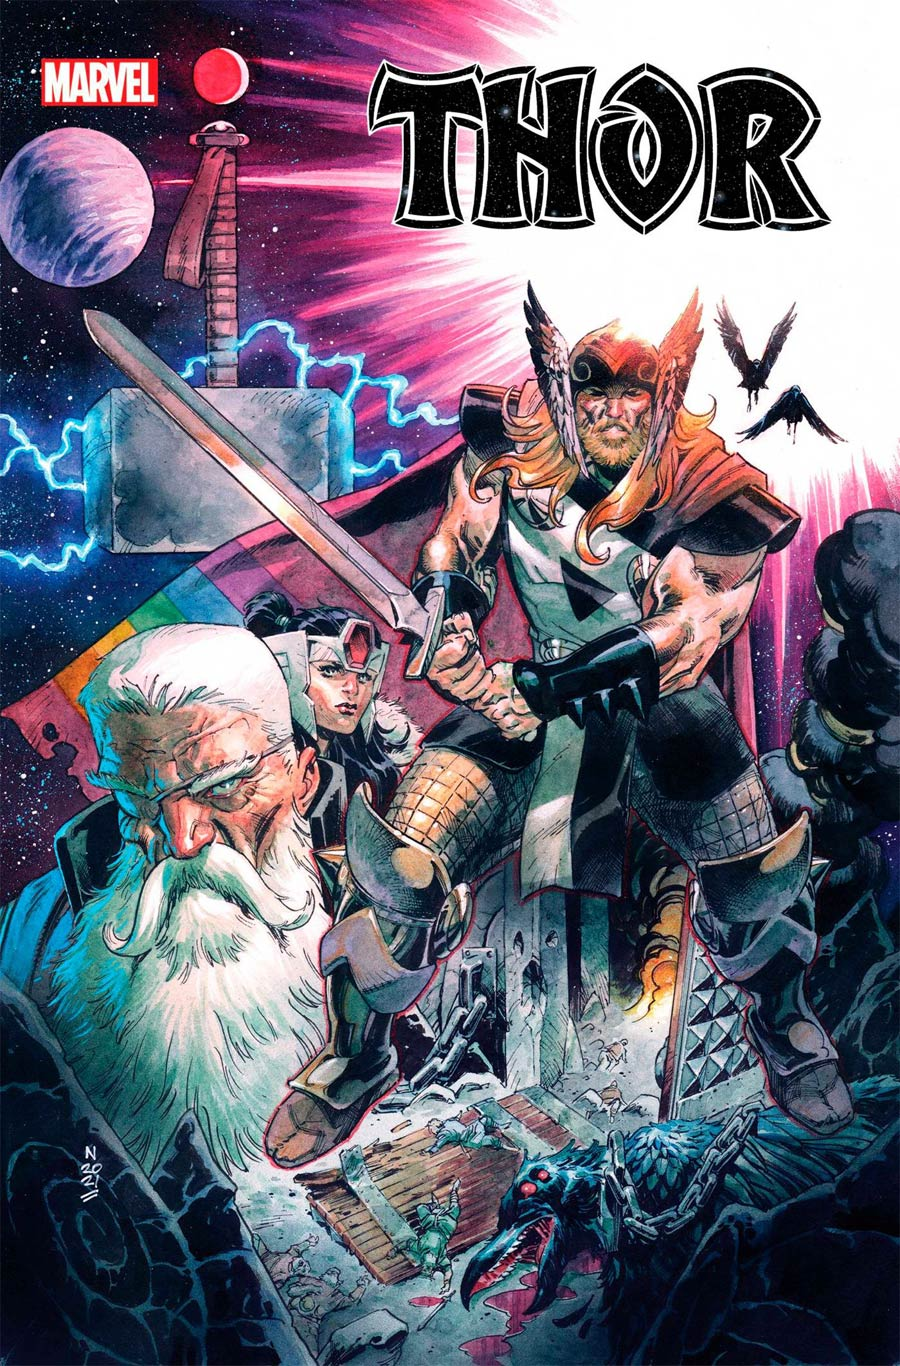 Thor Vol 6 #19 Cover A Regular Nic Klein Cover